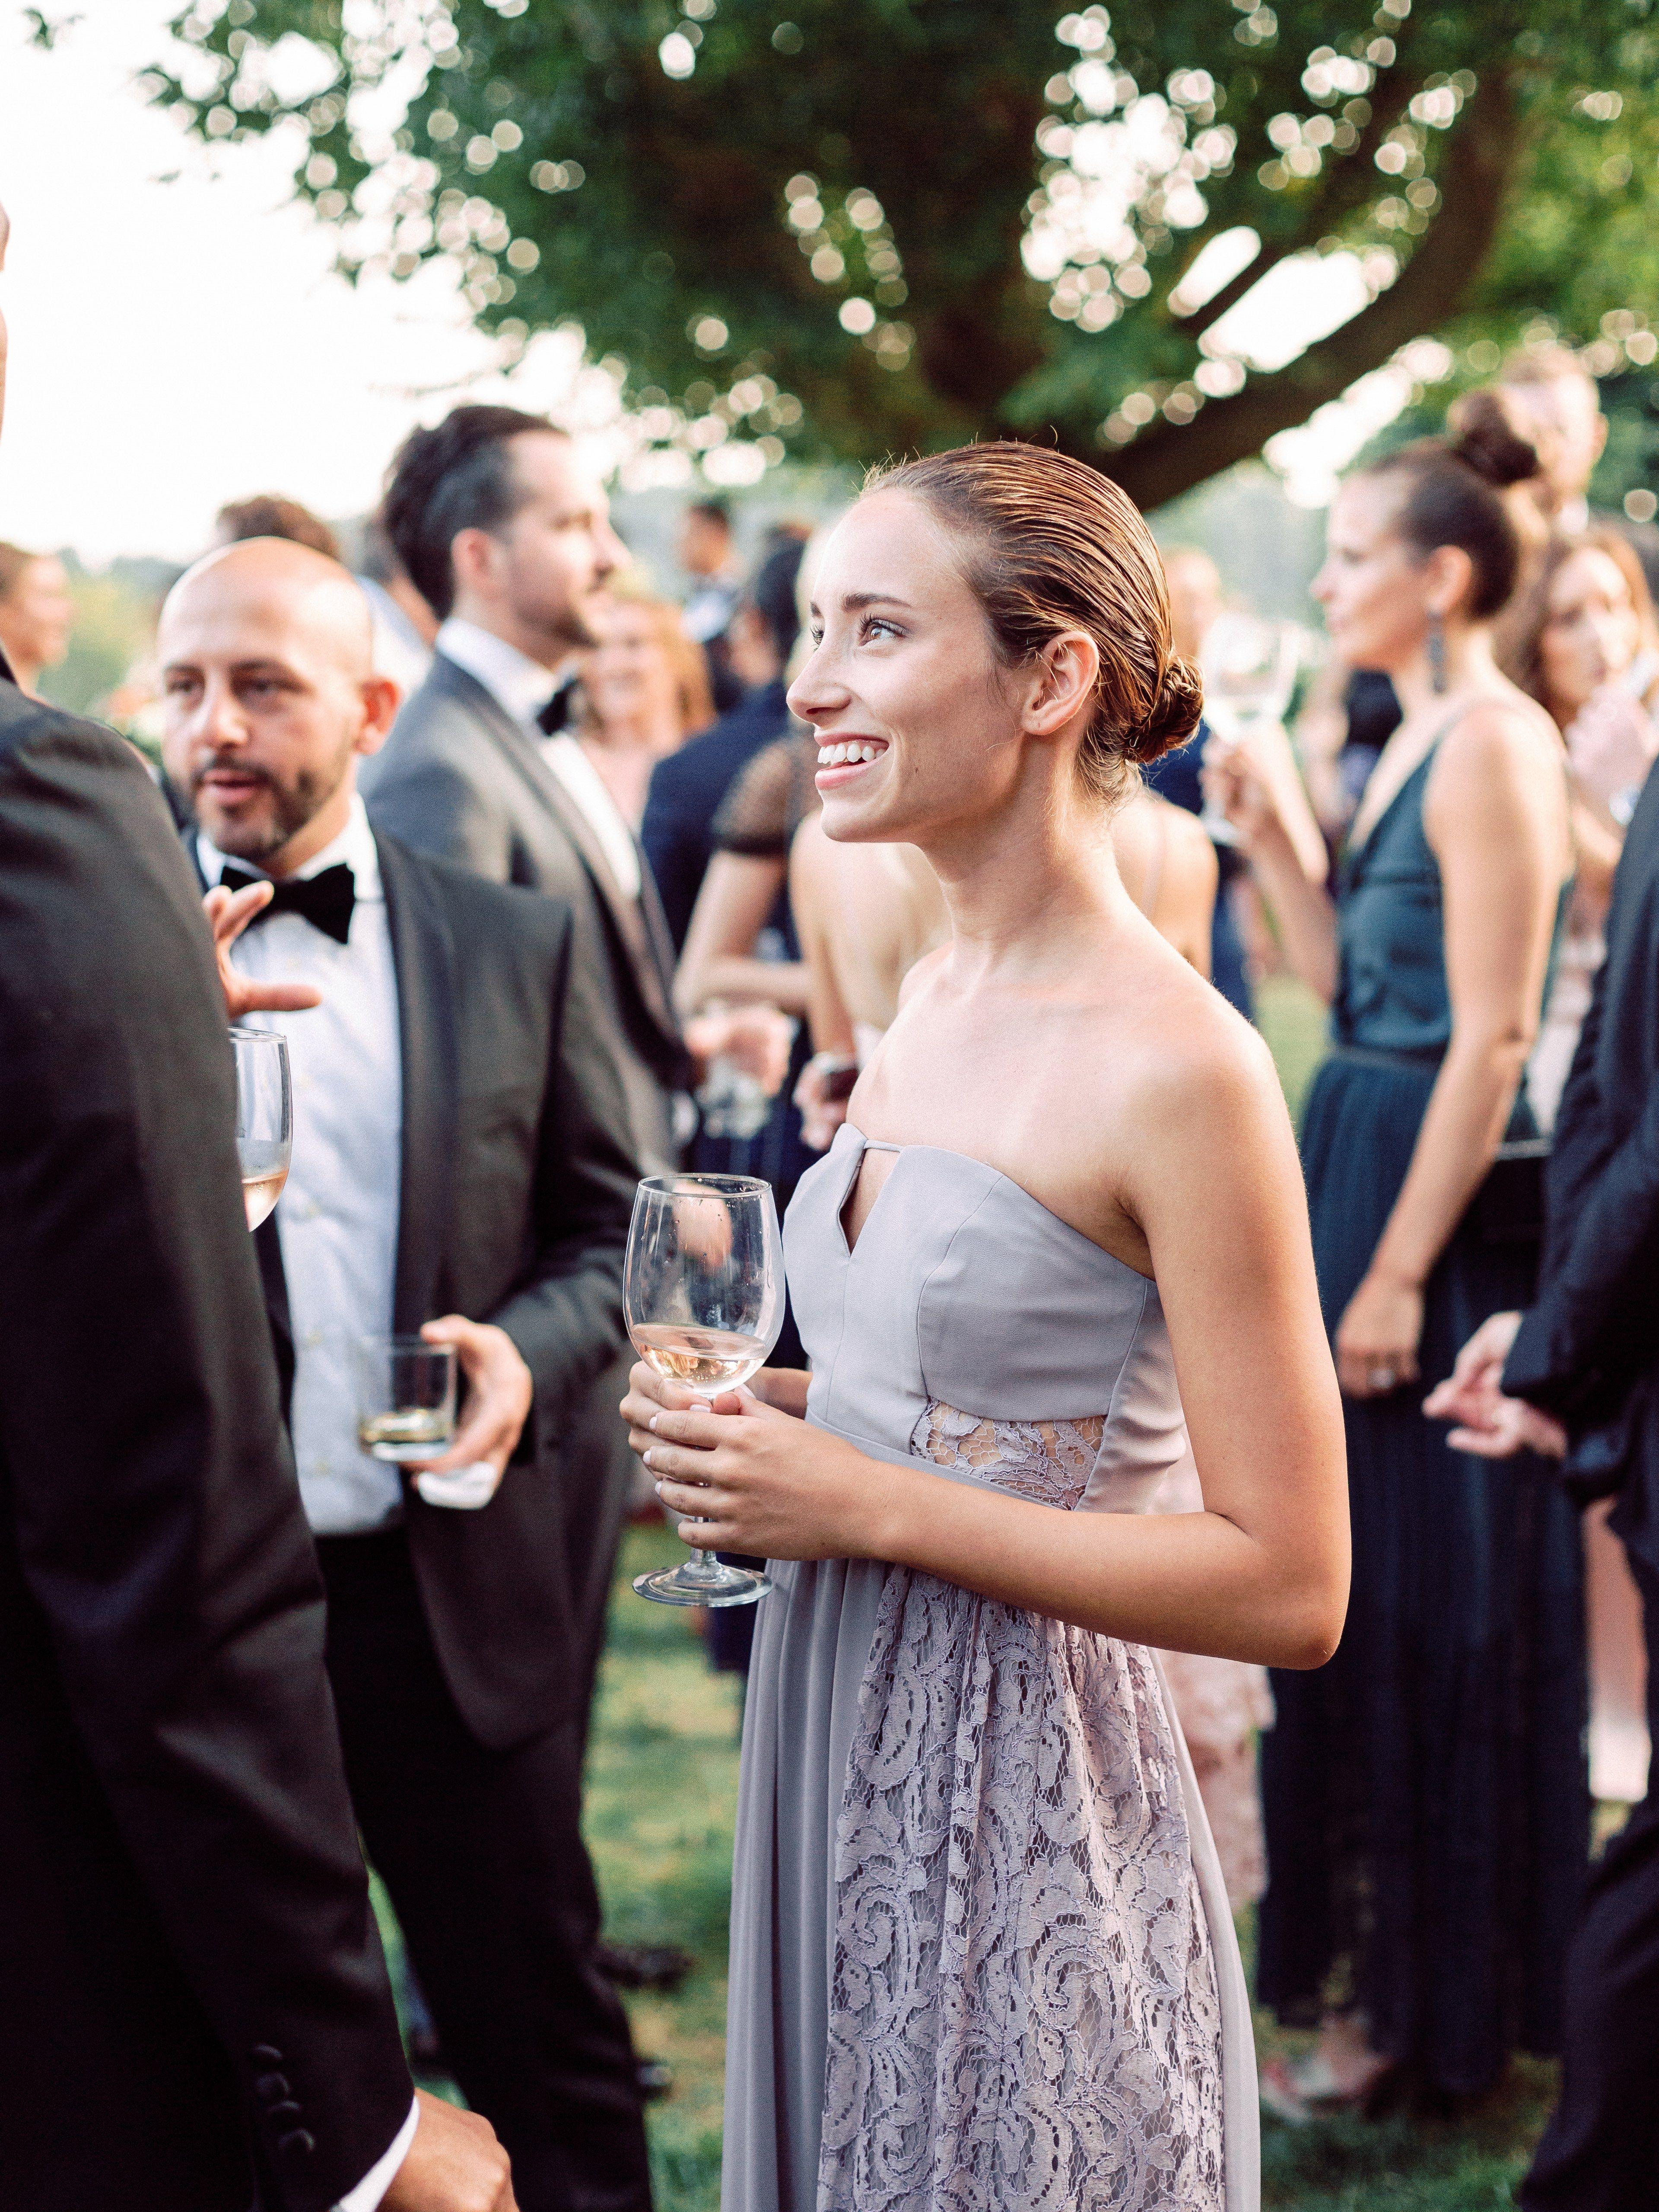 25 Elegant Formal Wedding Guest Dresses For A Black Tie Wedding Black Tie Wedding Guest Dress Black Tie Wedding Guest Dress Summer Black Tie Wedding Guests [ 5120 x 3840 Pixel ]